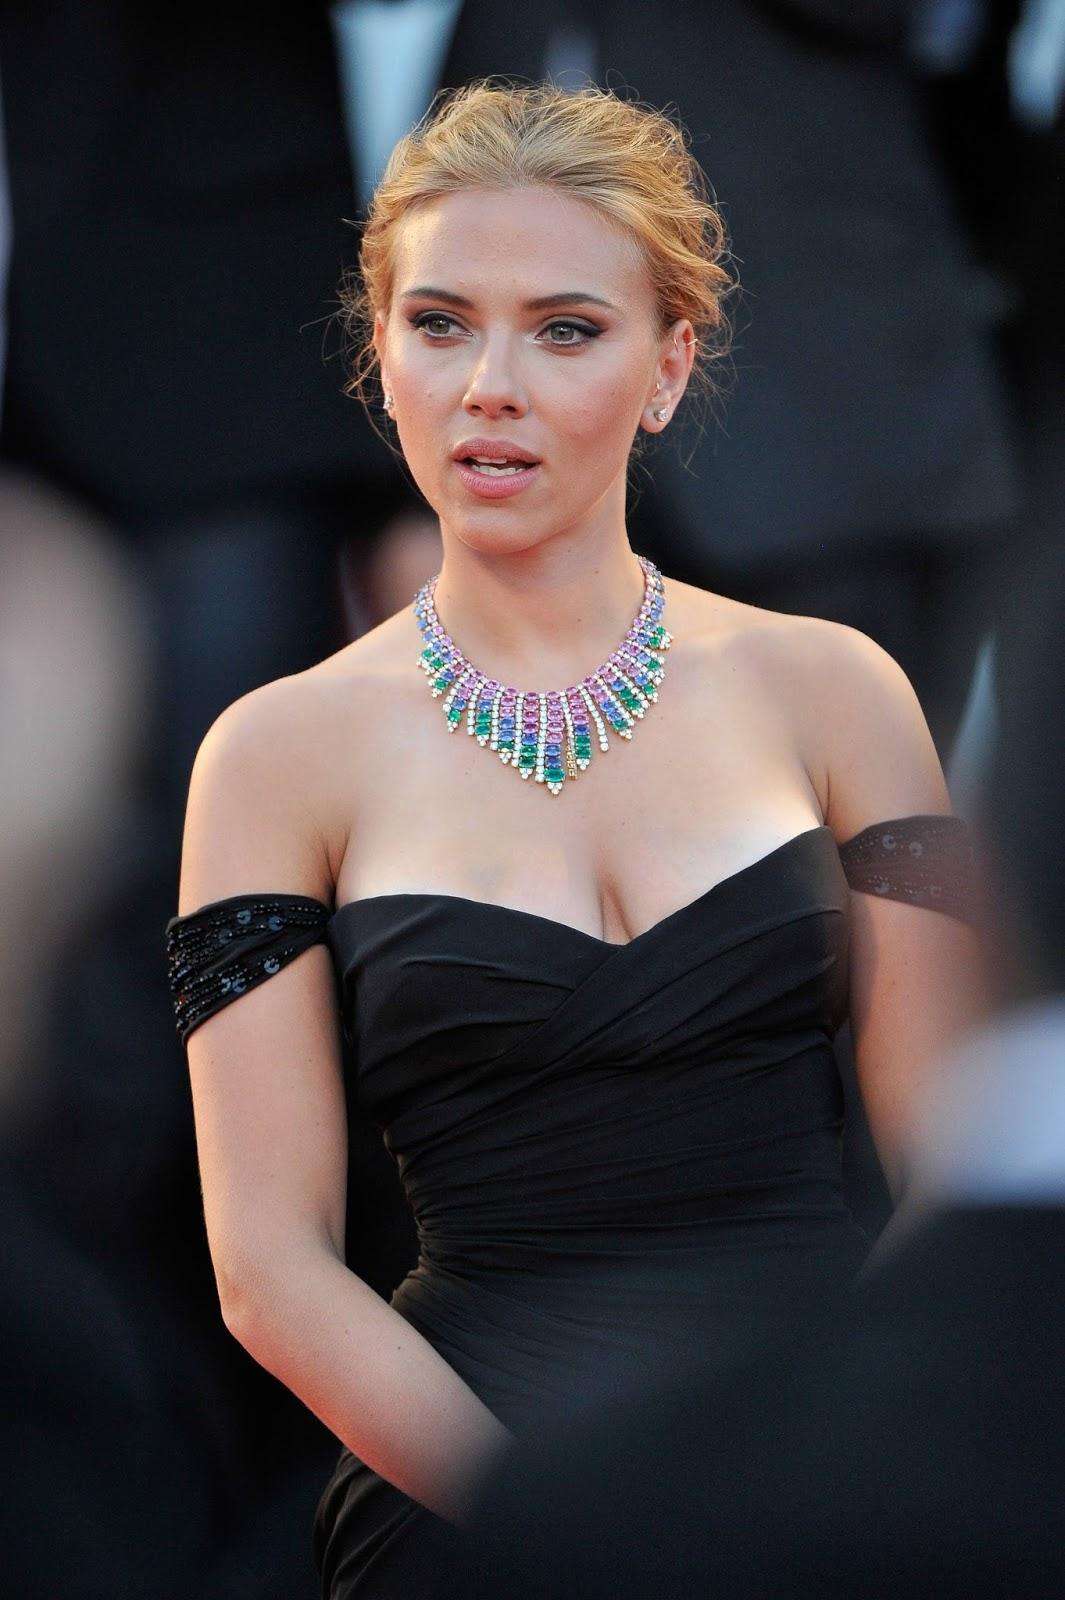 Scarlett Johansson Nude Images